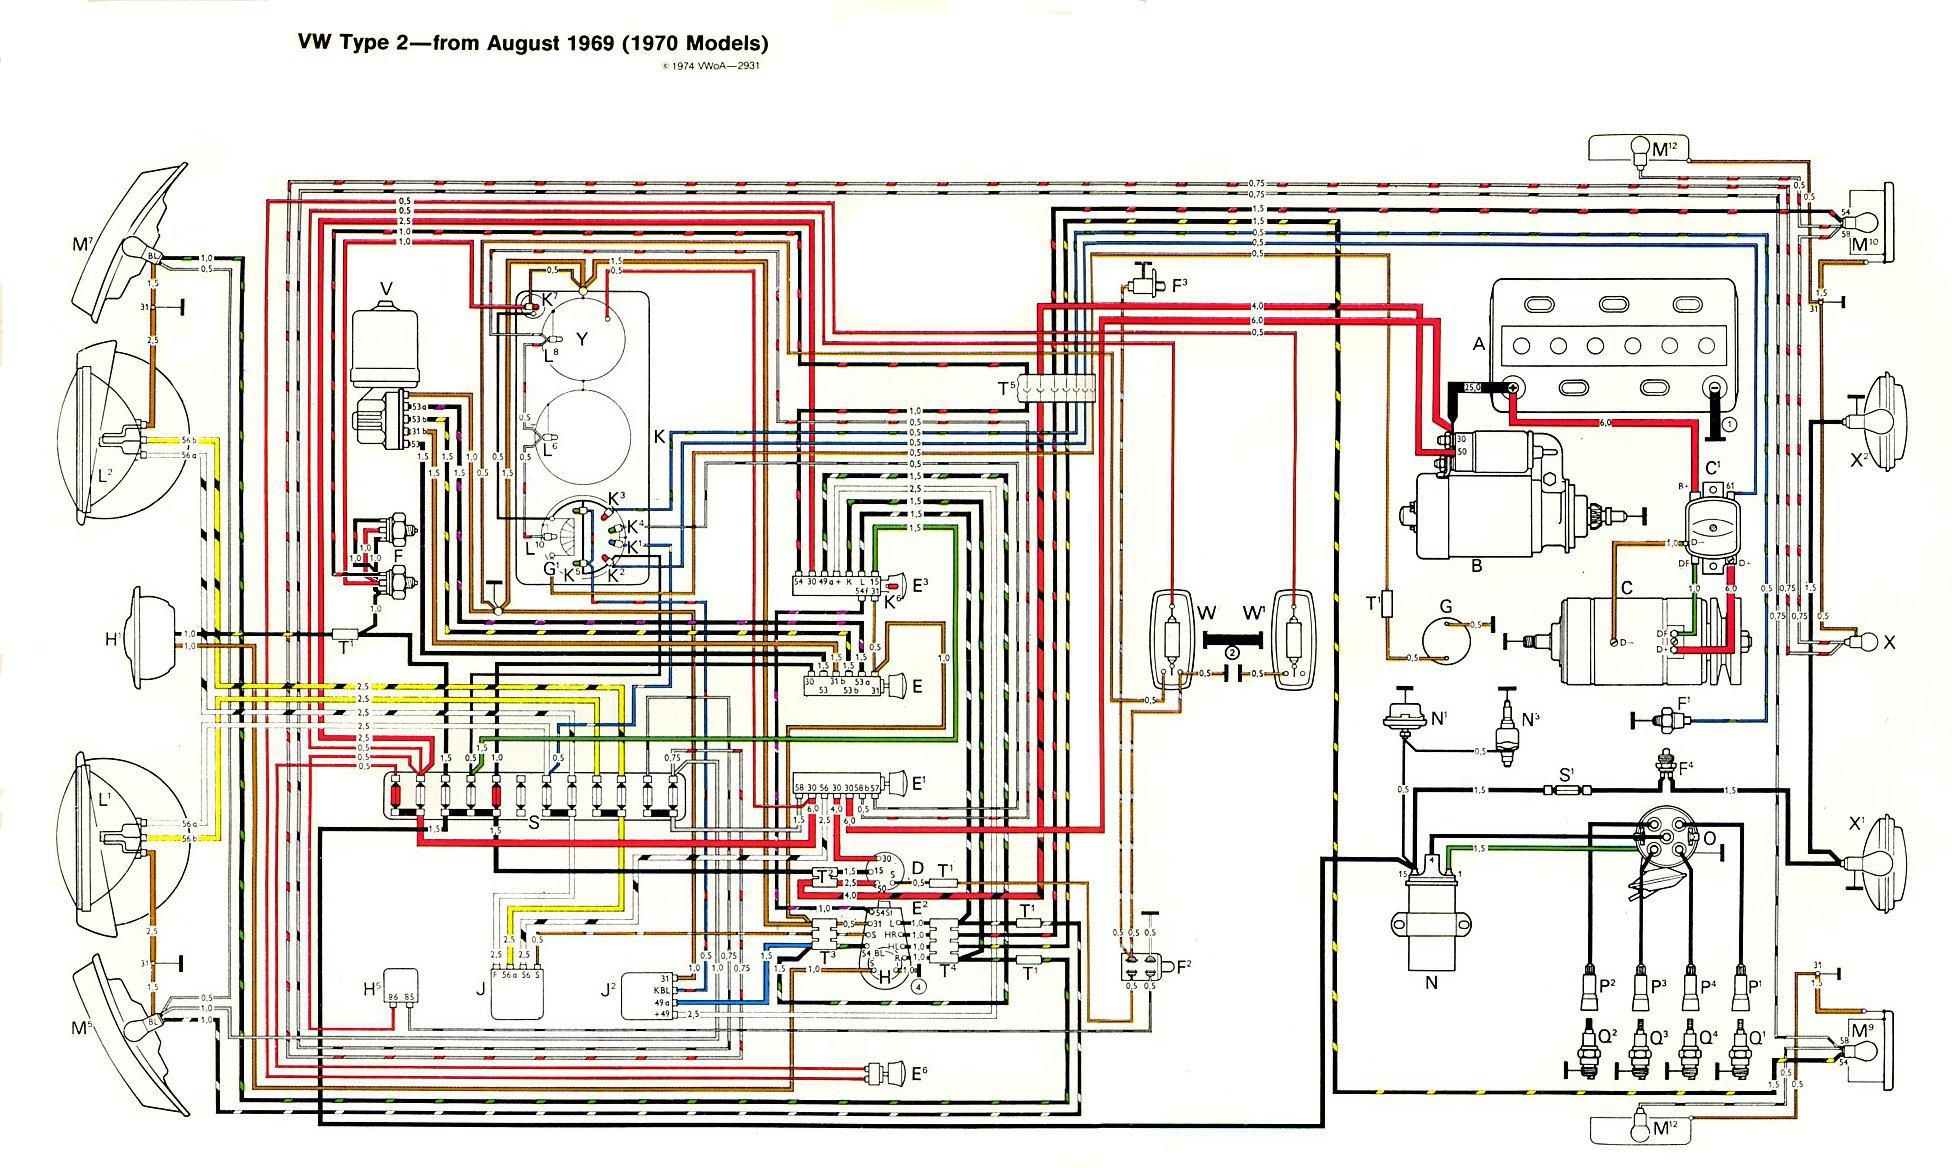 [SCHEMATICS_4NL]  Bad Boy Buggies Wiring Diagram - New Air Wiring Diagram -  tda2050.santai.decorresine.it | Newair Wiring Diagram |  | Wiring Diagram Resource